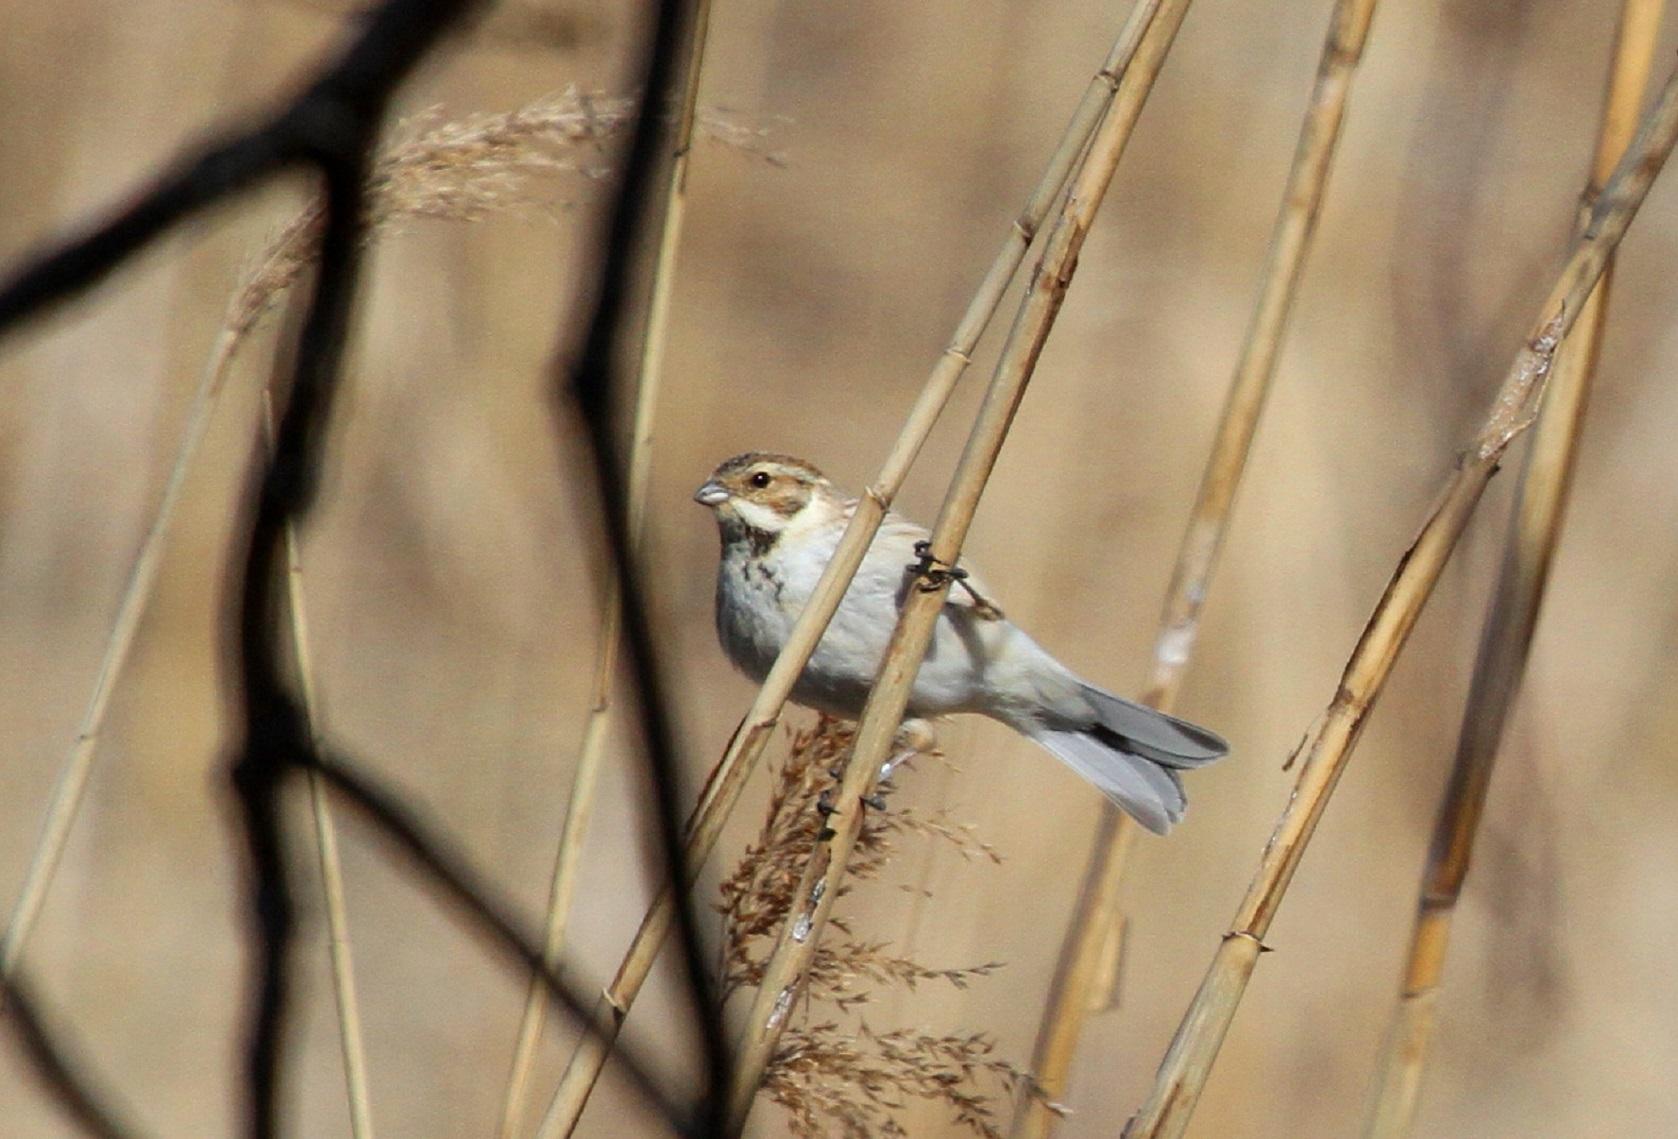 MFで出会えた、冬鳥オオジュリン冬羽から夏羽に変わりつつ_f0239515_22039.jpg